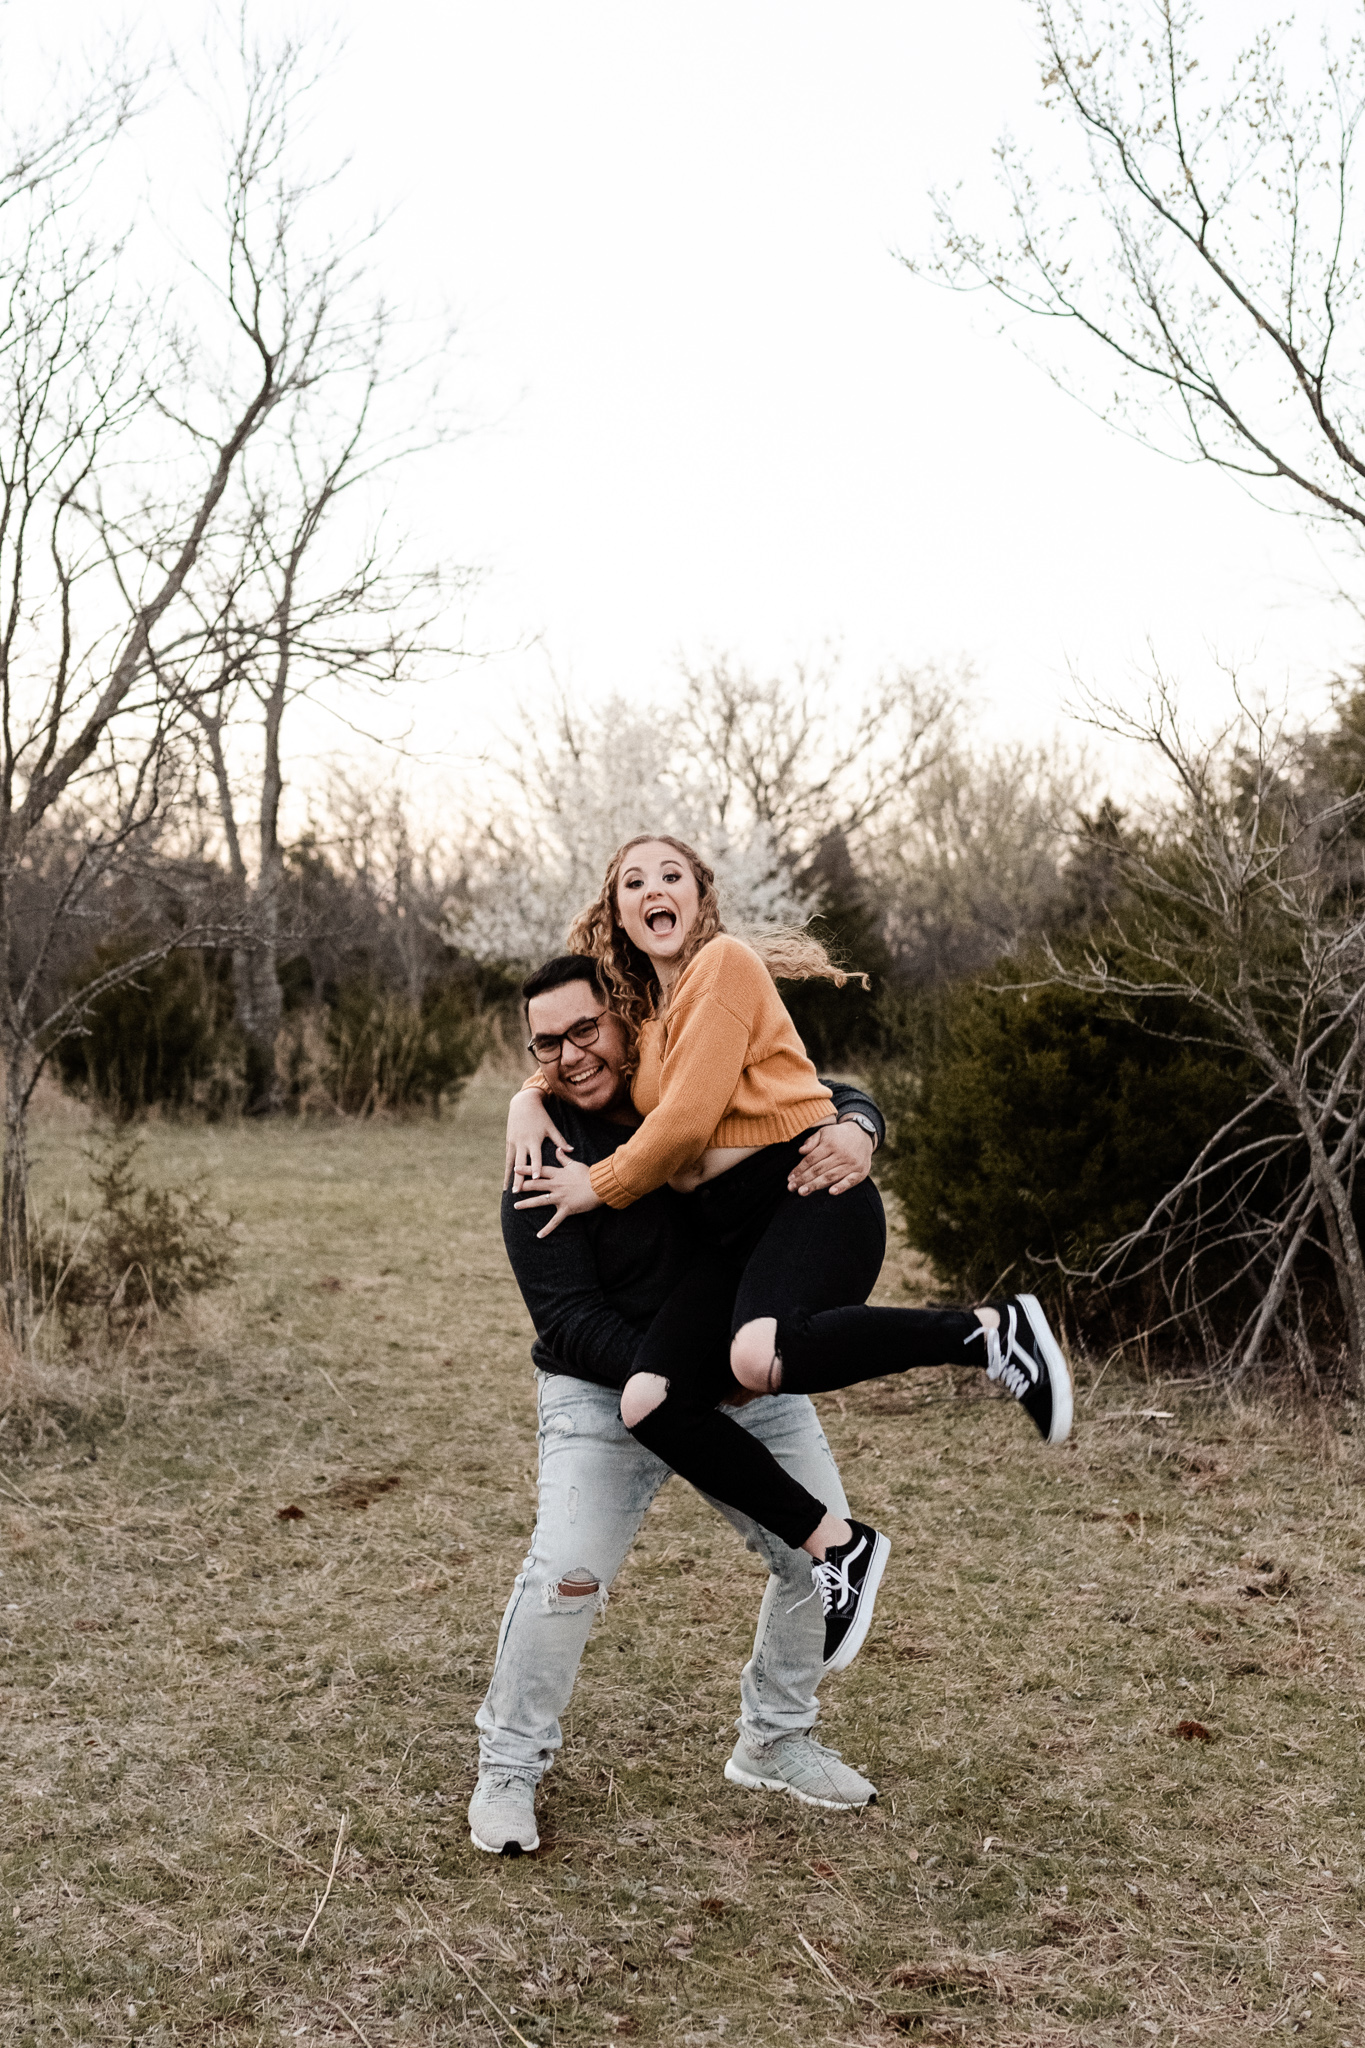 Galindo Engagements-Oklahoma Wedding Photographer-34.jpg